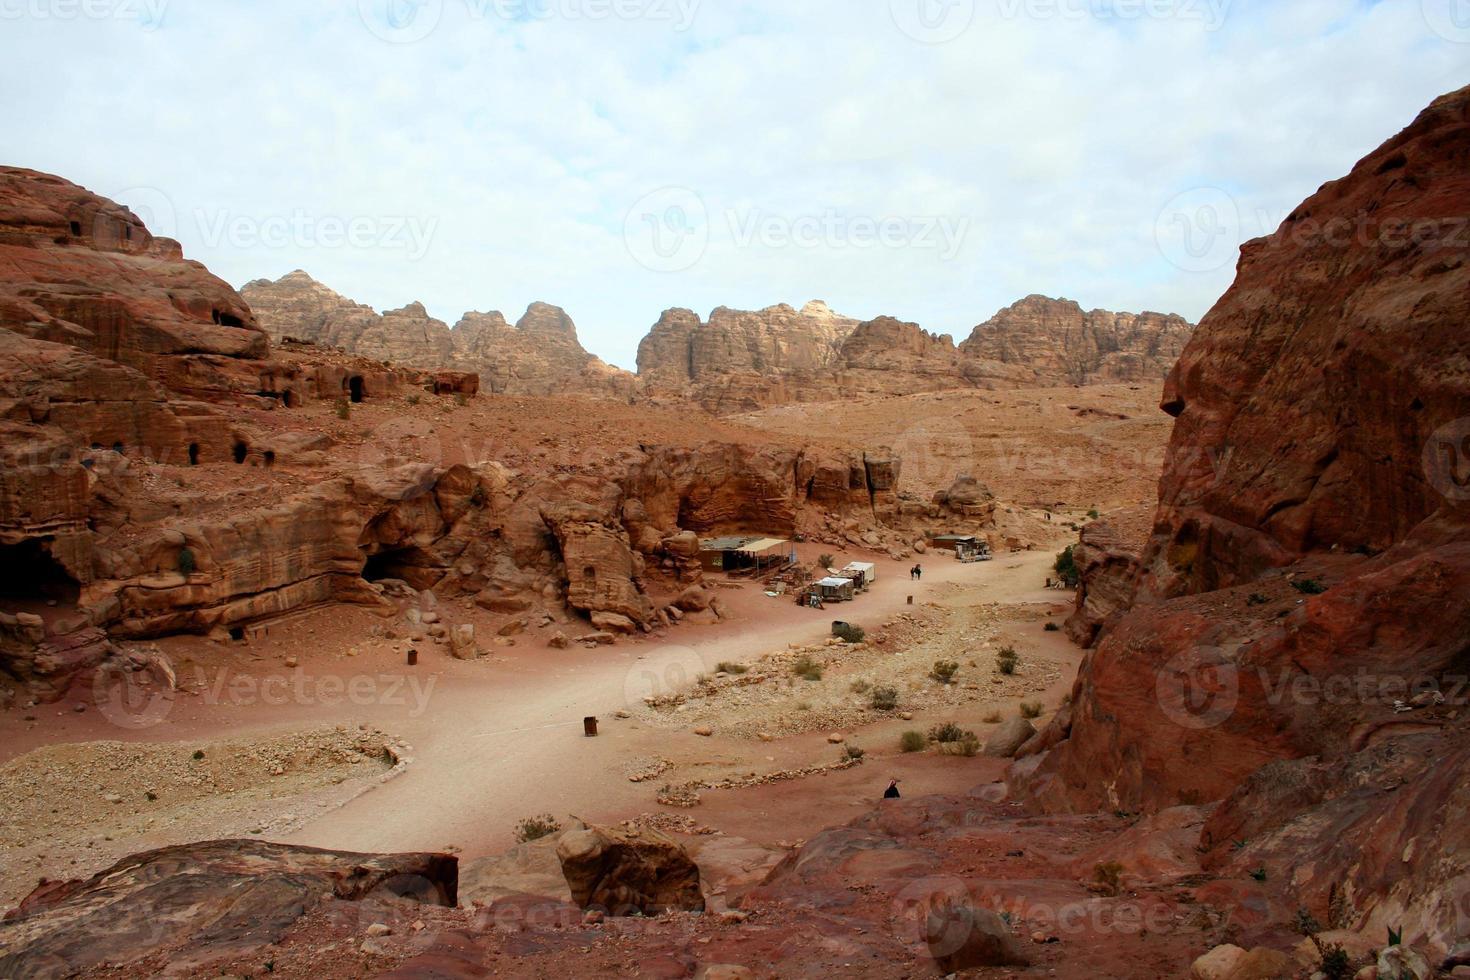 Gräber in den roten Sandstein in Petra, Jordanien geschnitzt foto